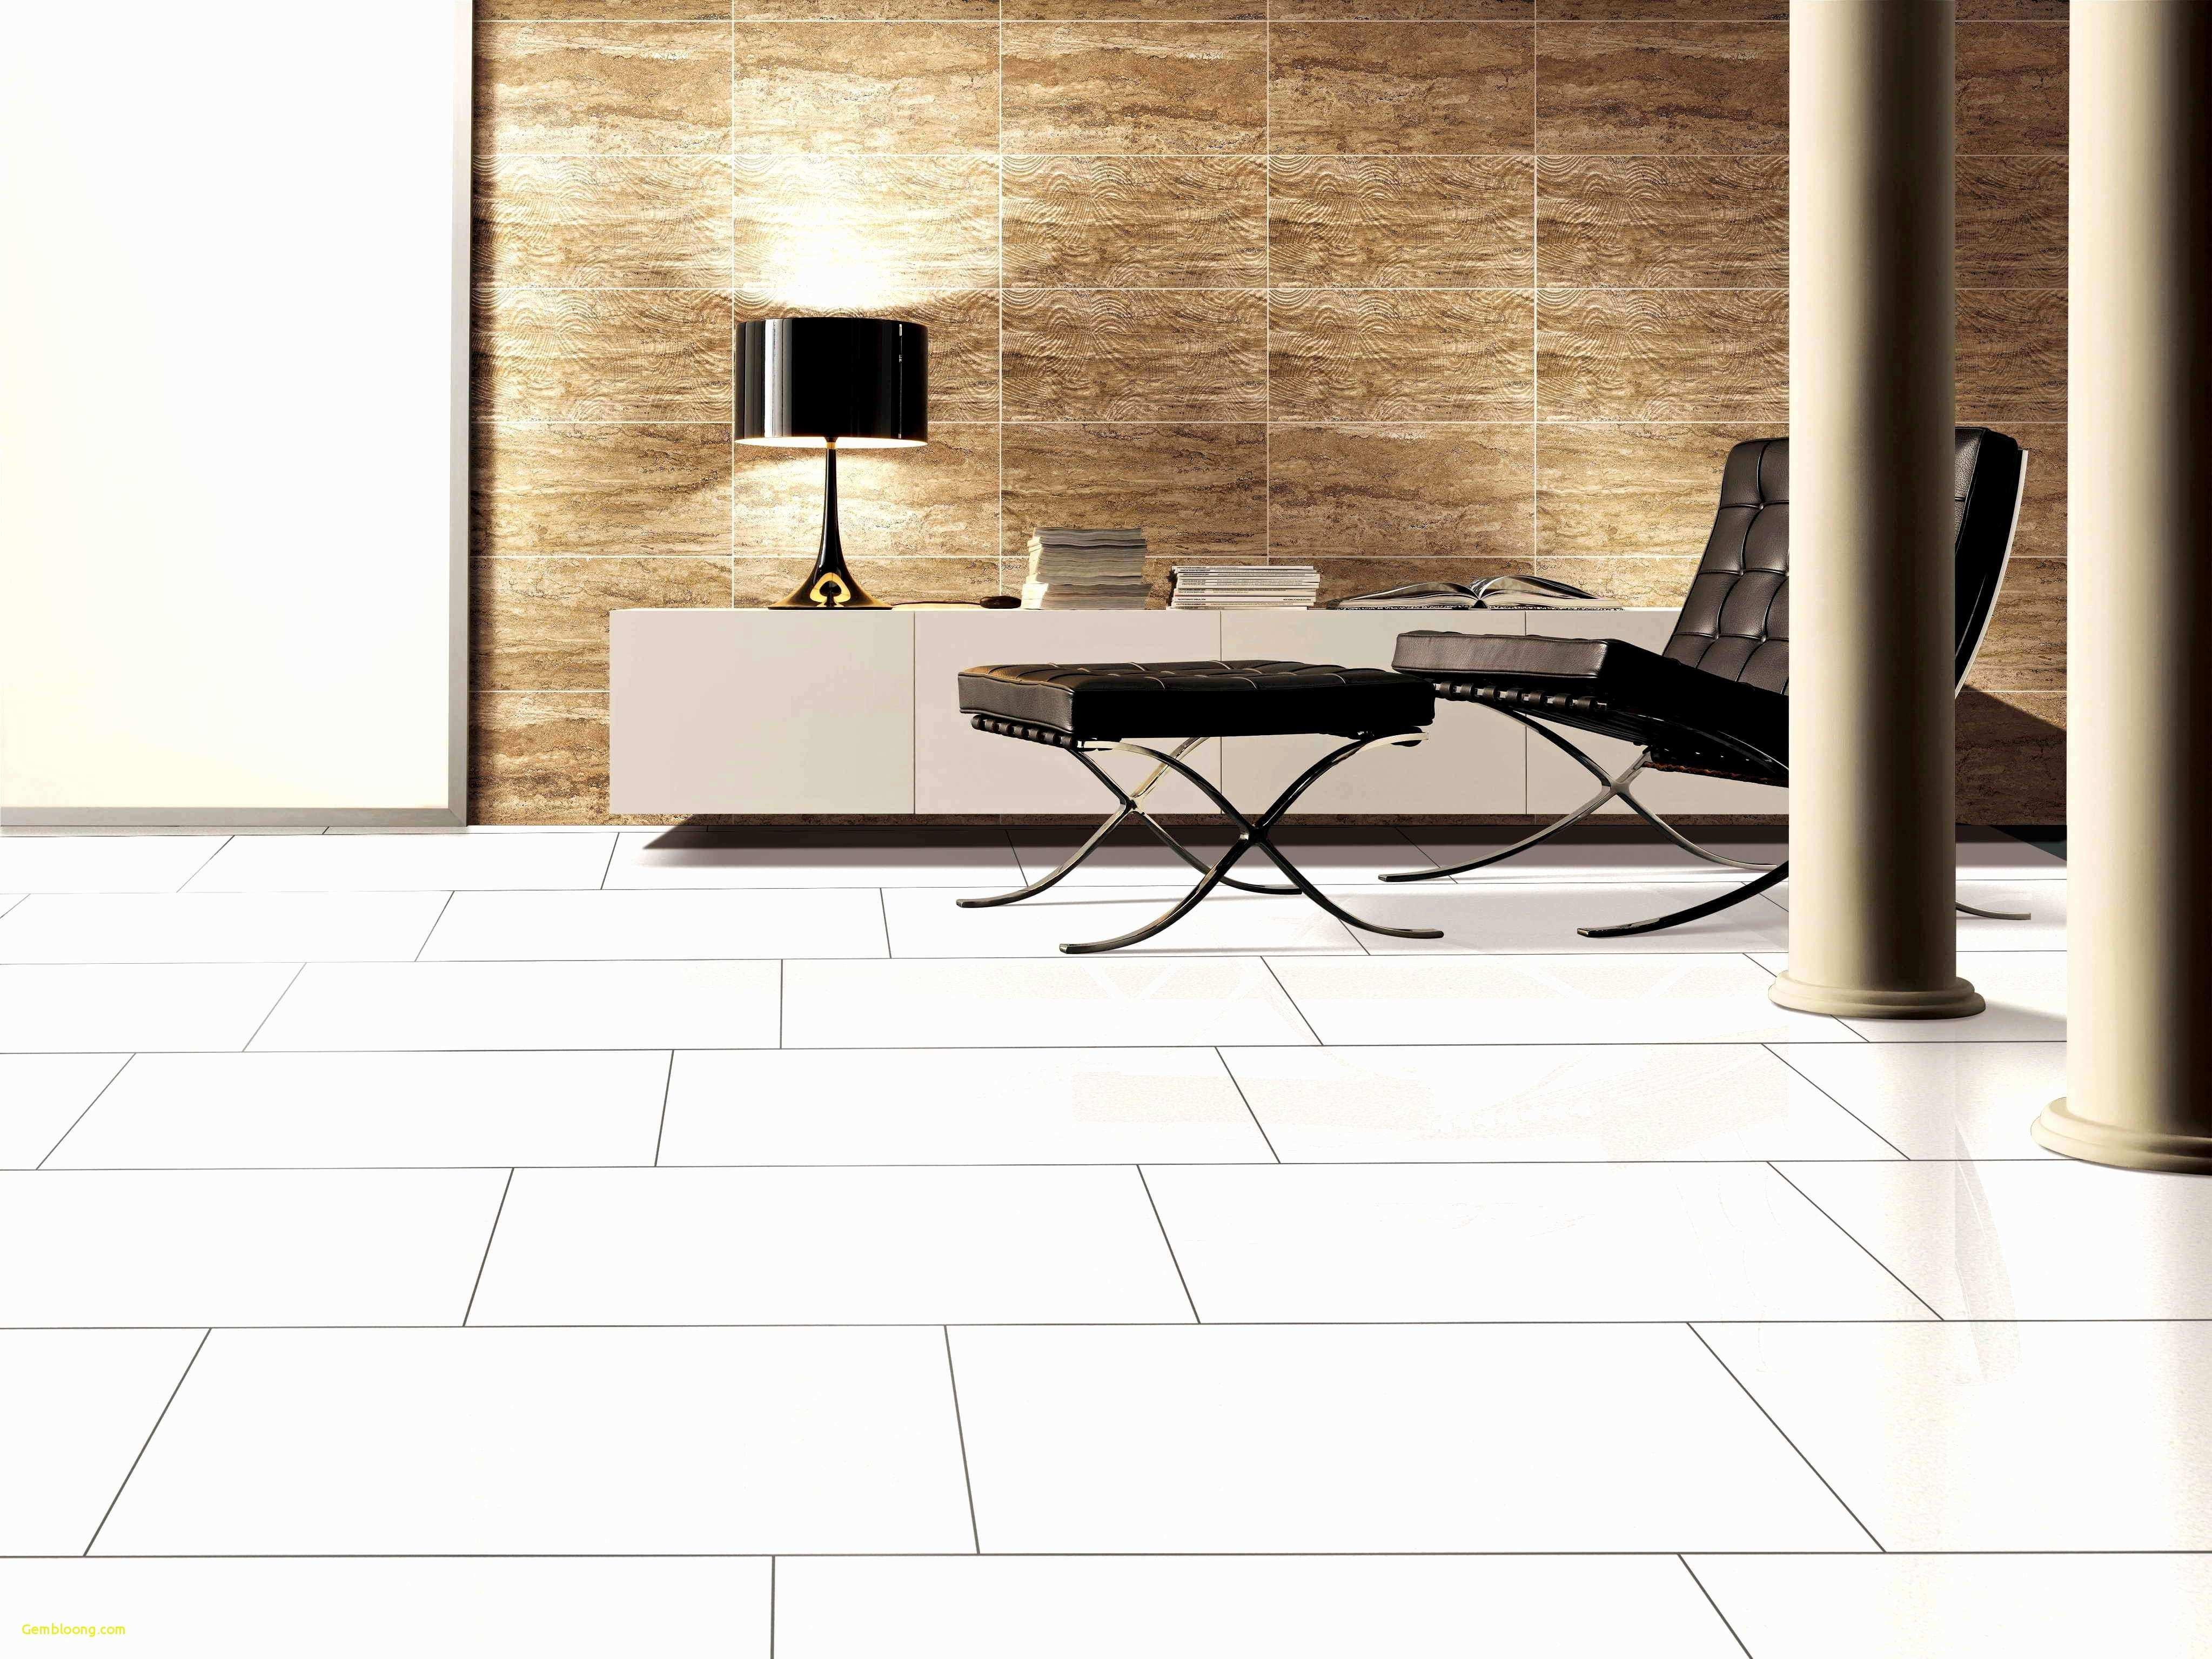 is hardwood flooring worth it of wood for floors facesinnature with regard to wood for floors mosaic bathroom designs refrence new tile floor mosaic bathroom 0d